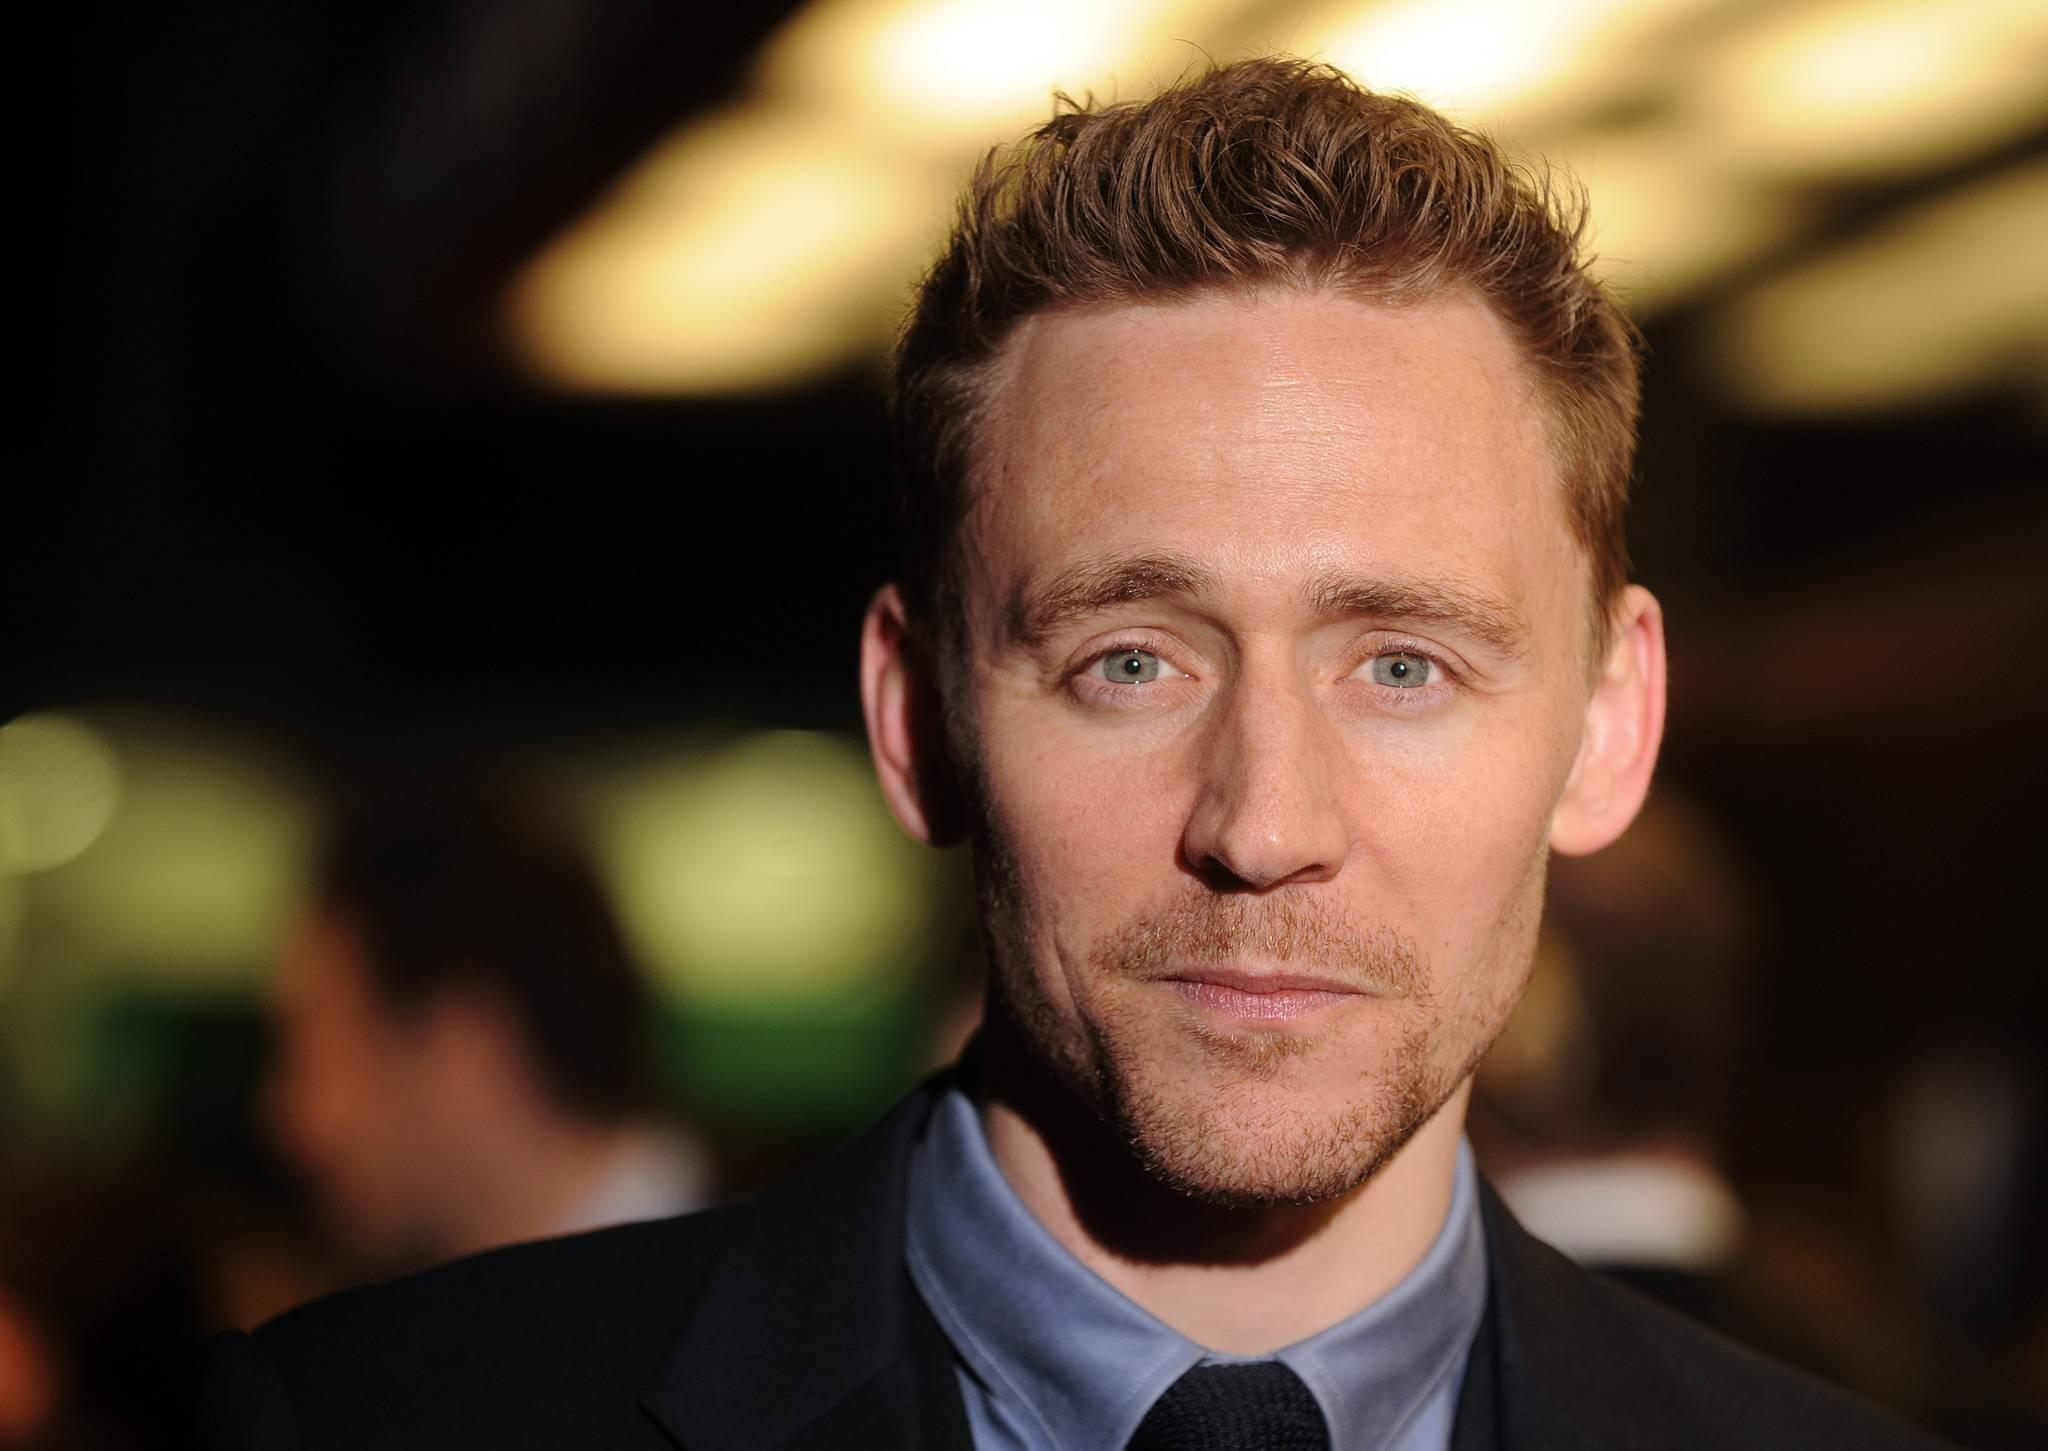 Tom Hiddleston Widescreen for desktop